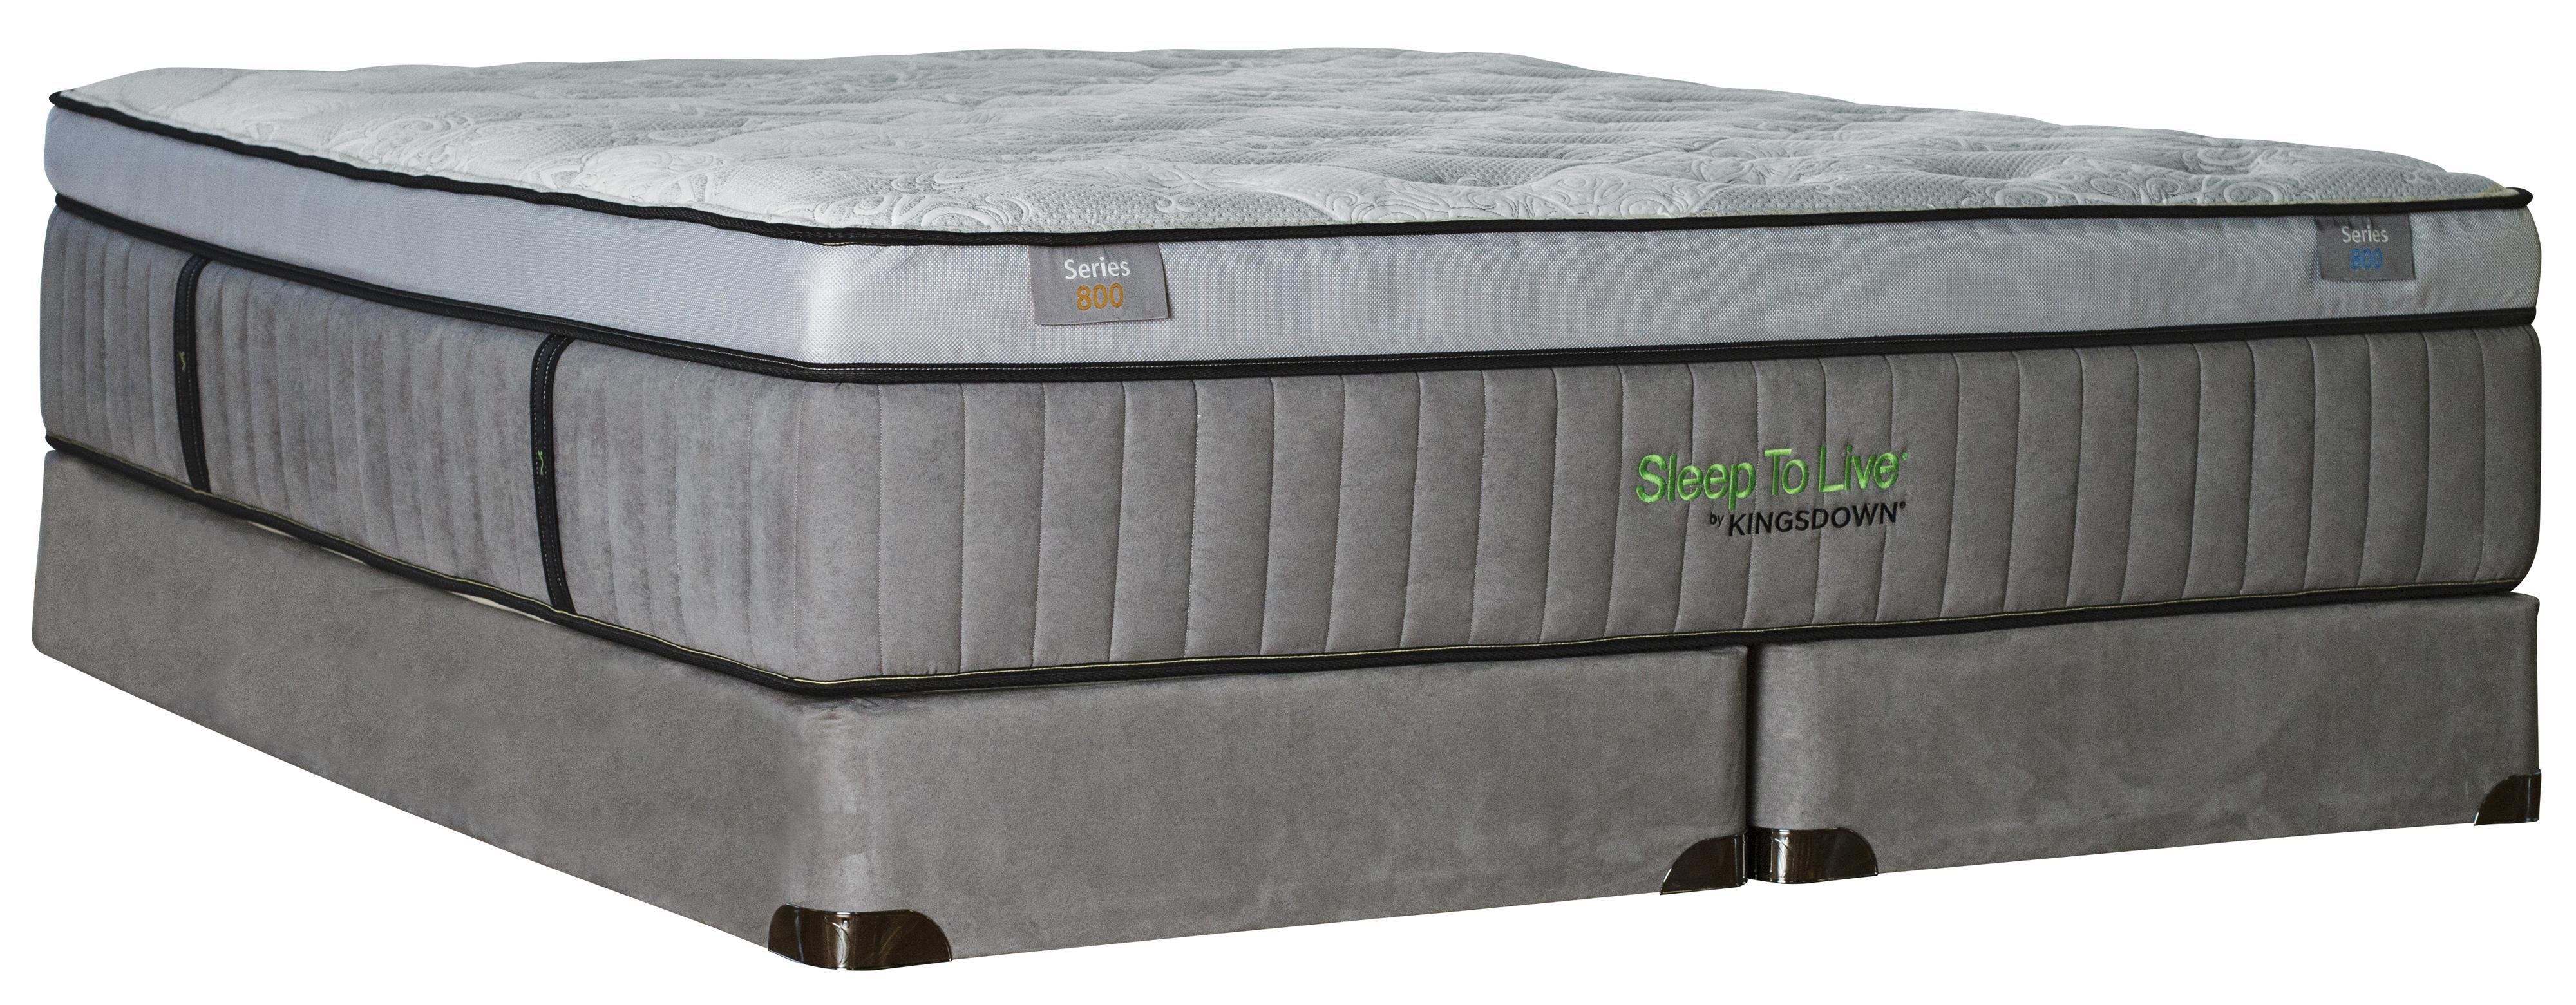 Kingsdown Sleep to Live 800 Queen Luxurios Box Top Mattress - Item Number: Series800-Q